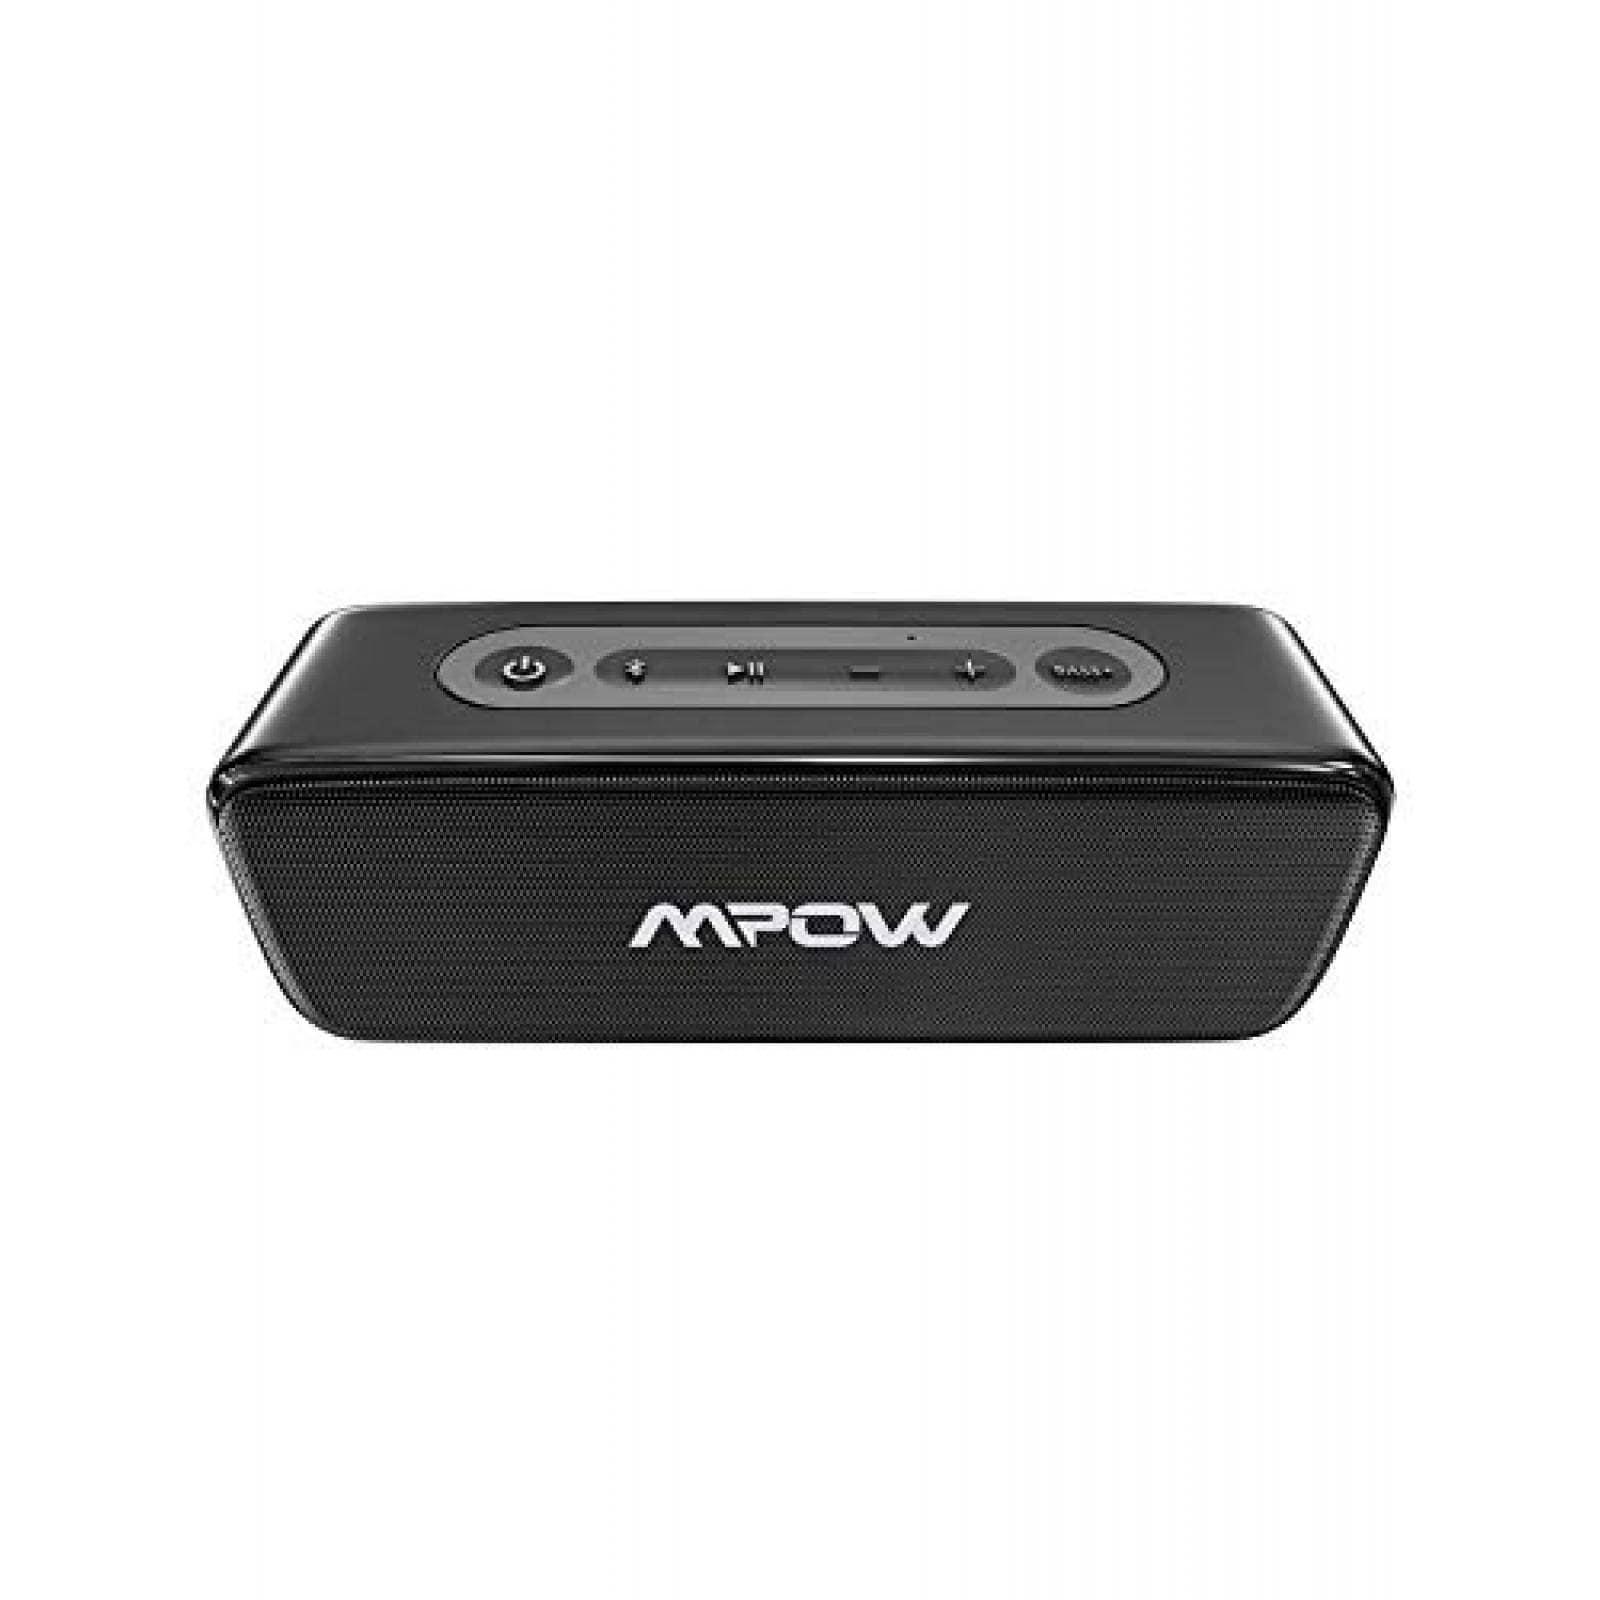 Altavoz Bluetooth Mpow SoundHot R6 impermeable -Negro